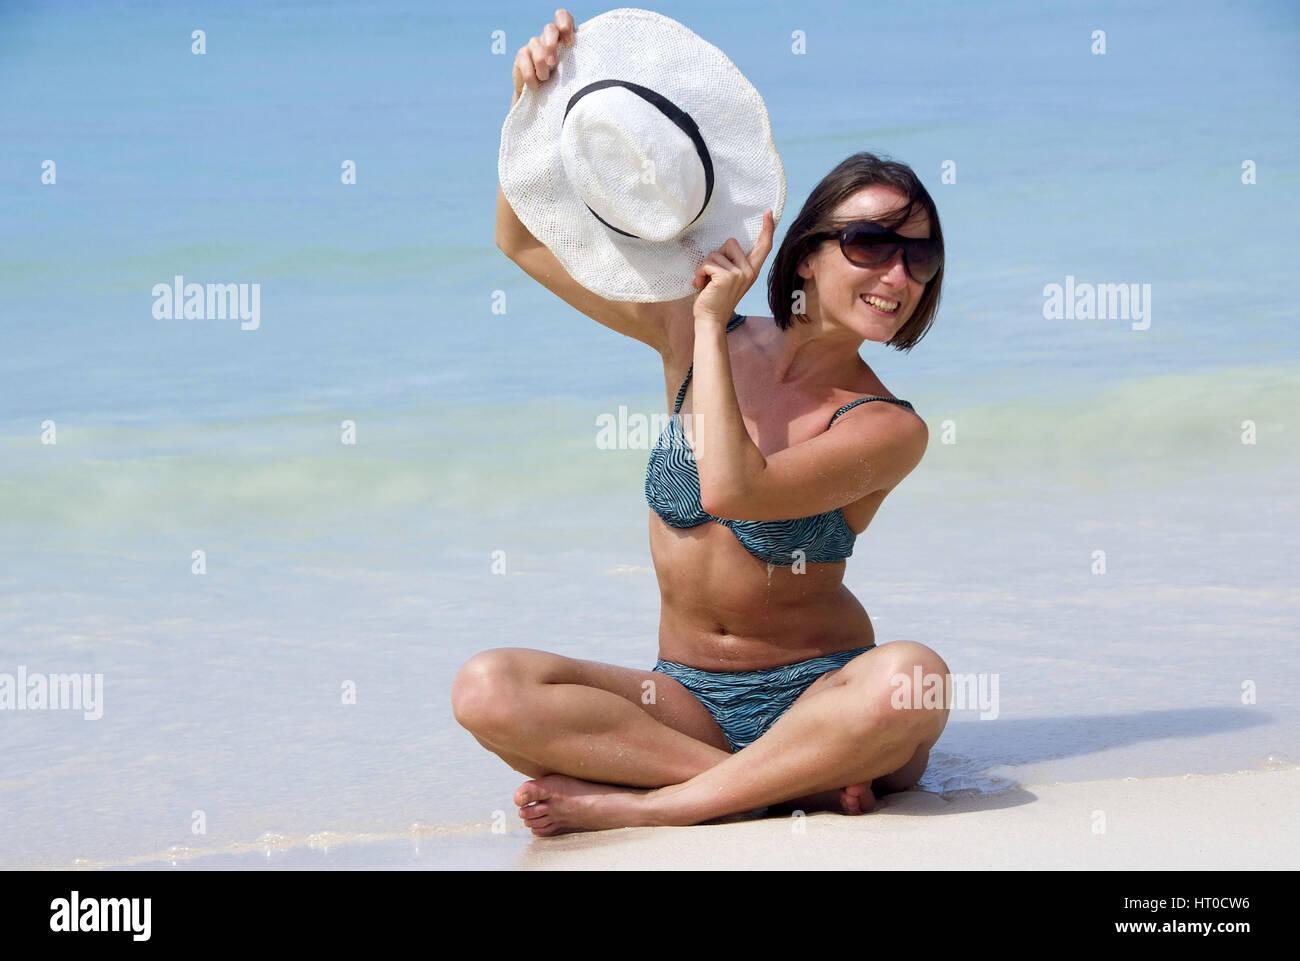 Junge Frau im Bikini am Meeresufer - young woman on the beach - Stock Image